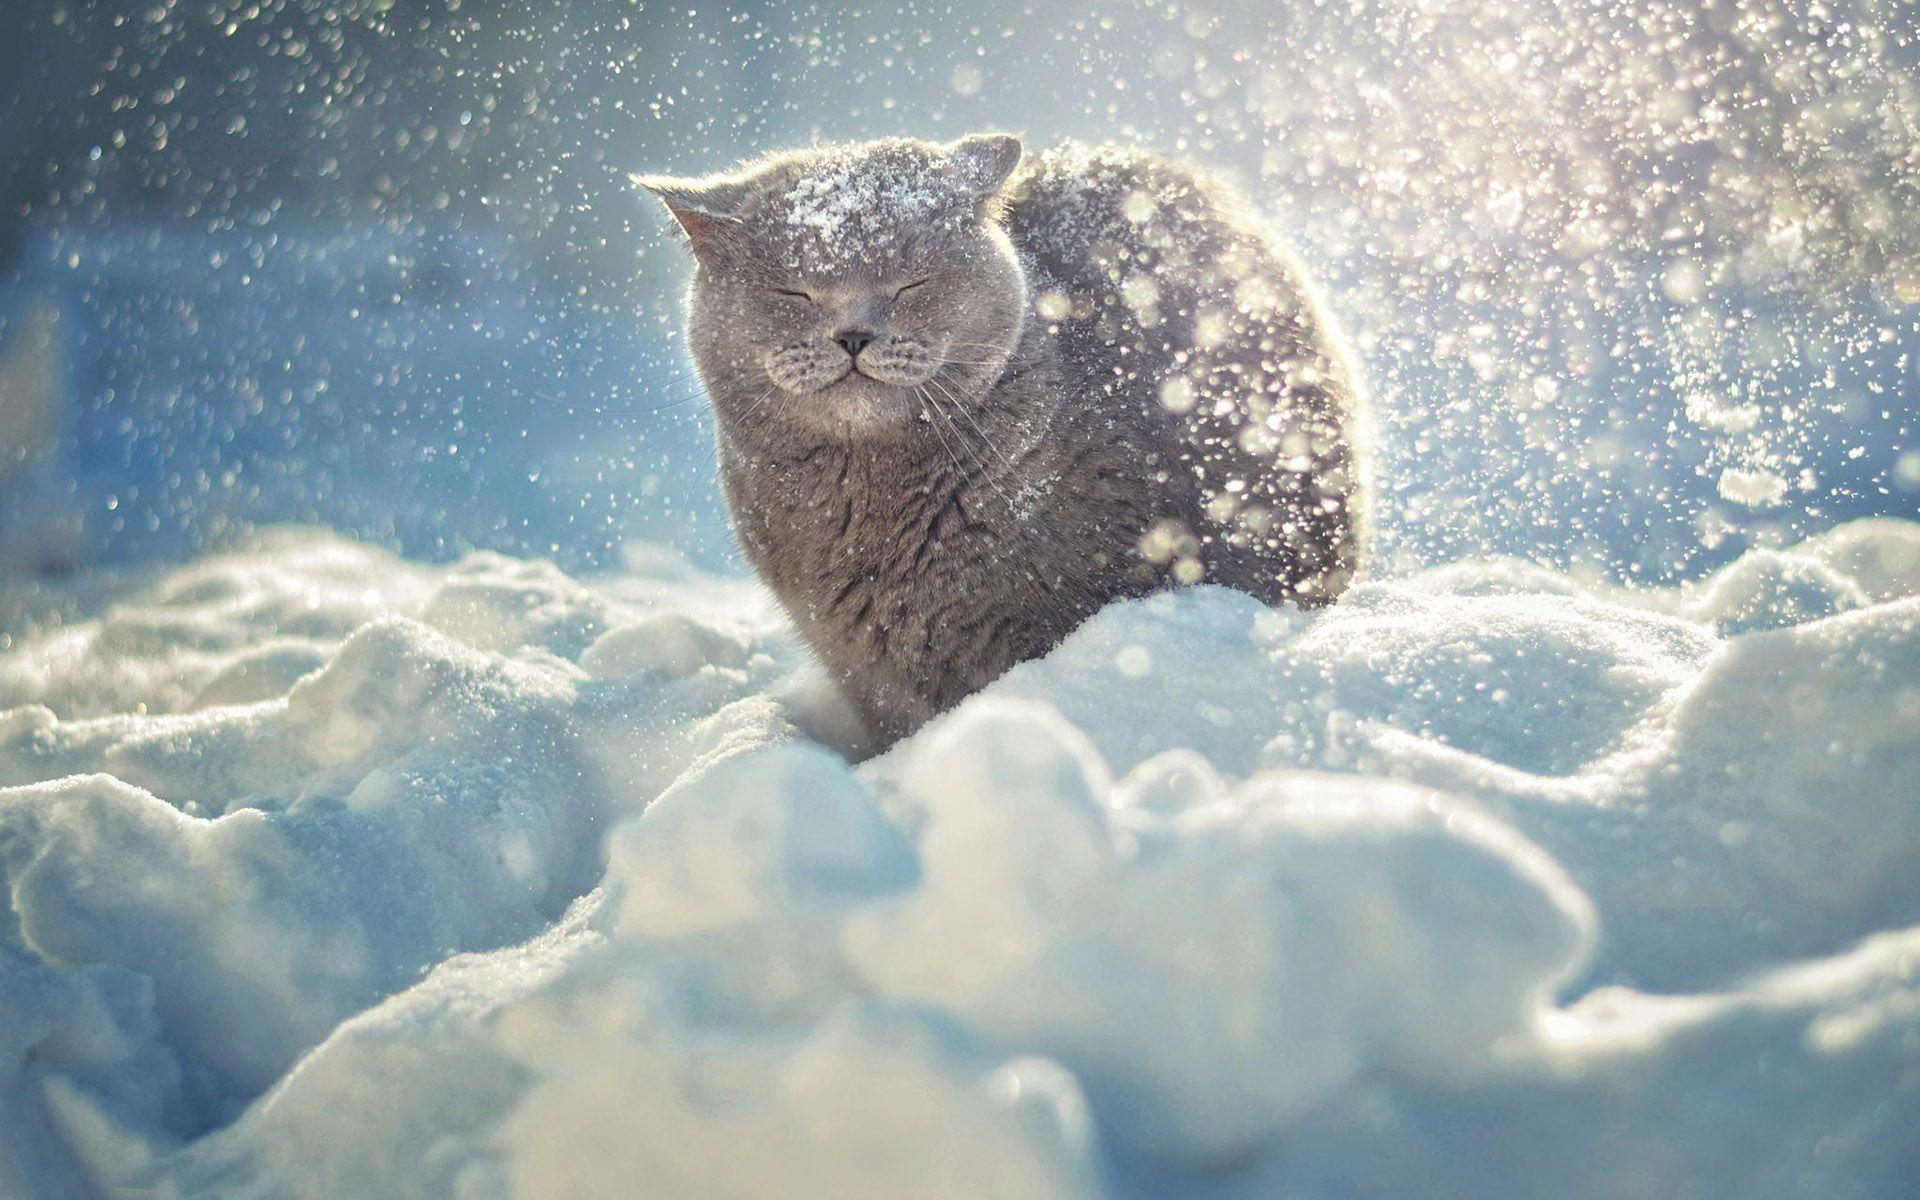 Cute Animals Playing Soccer Wallpaper ワイドスクリーン::高精細:雪のhdデスクトップの壁紙を楽しんで猫フルスクリーン